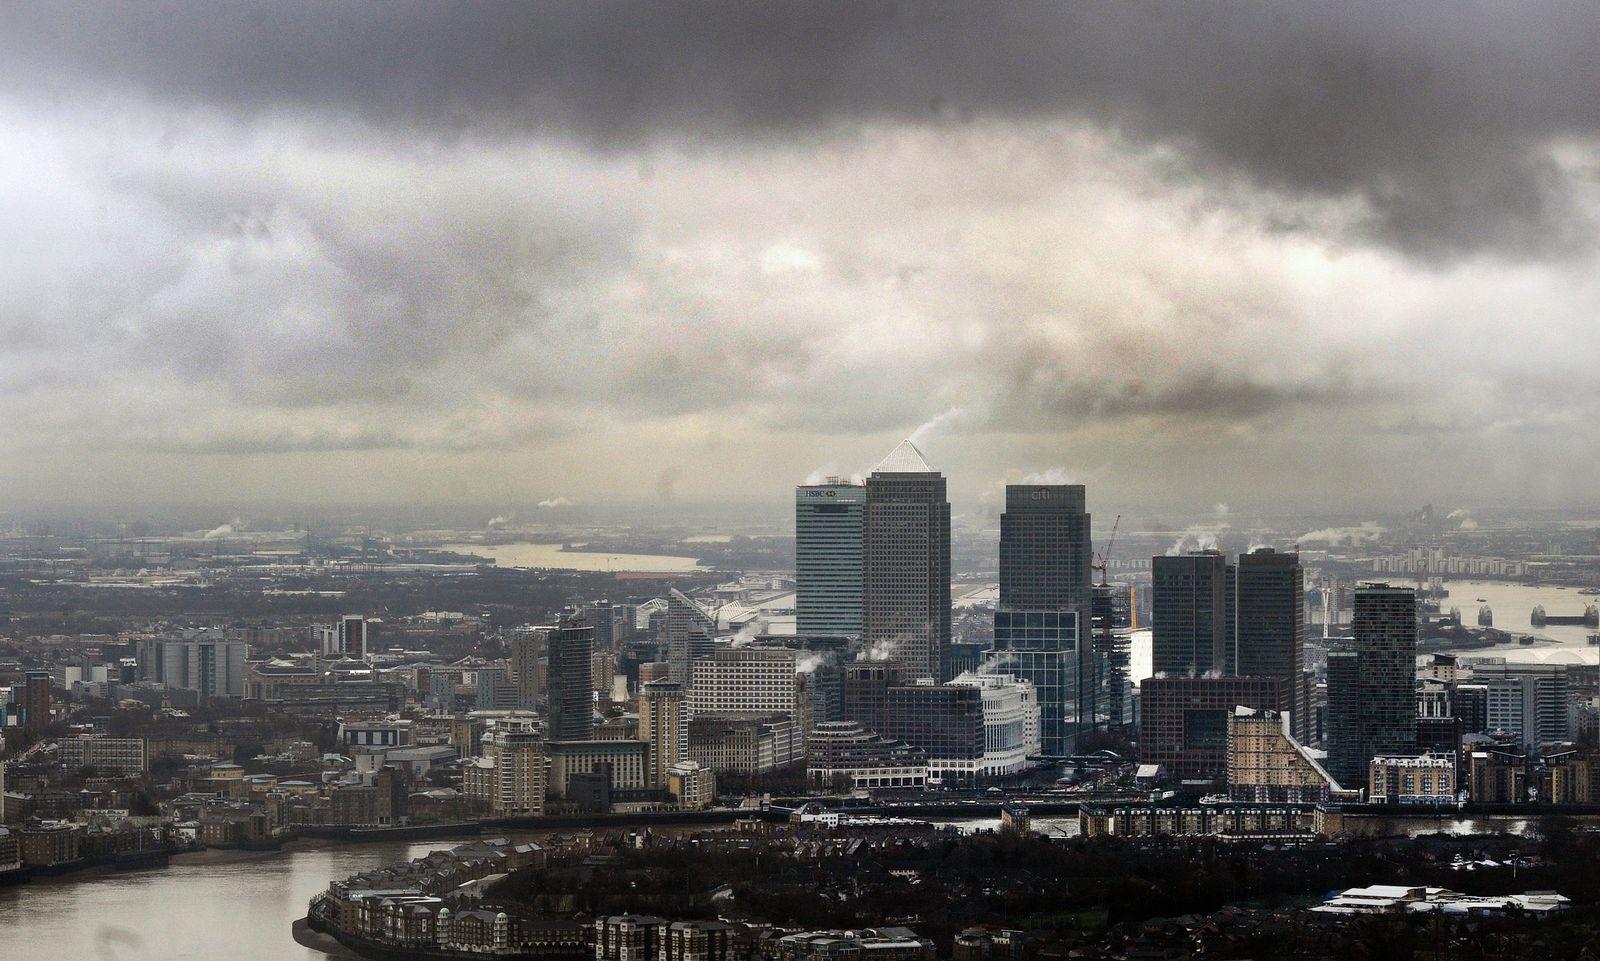 EU to cap bankers' bonuses under sweeping reforms